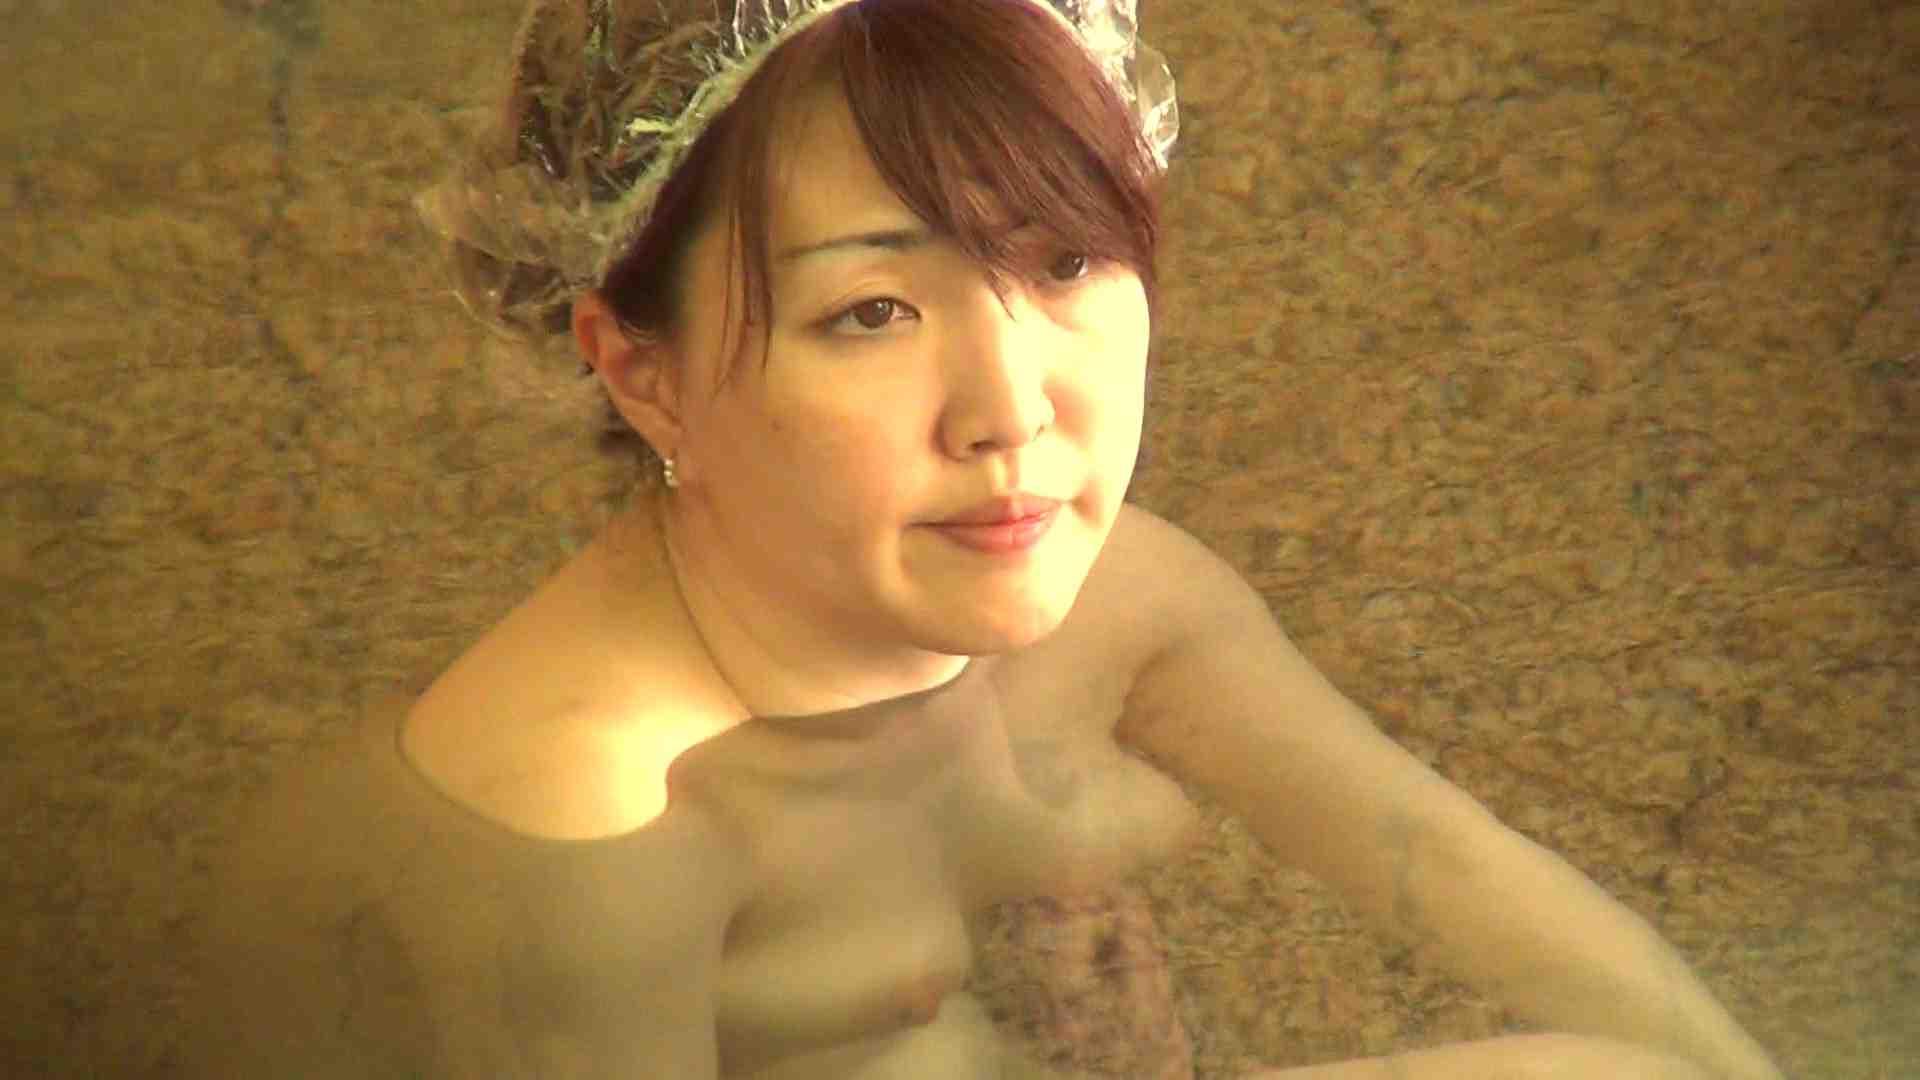 Vol.81 【閲覧注意】極熟肉オンパレード! 細身・スレンダー   アラ40  59画像 49